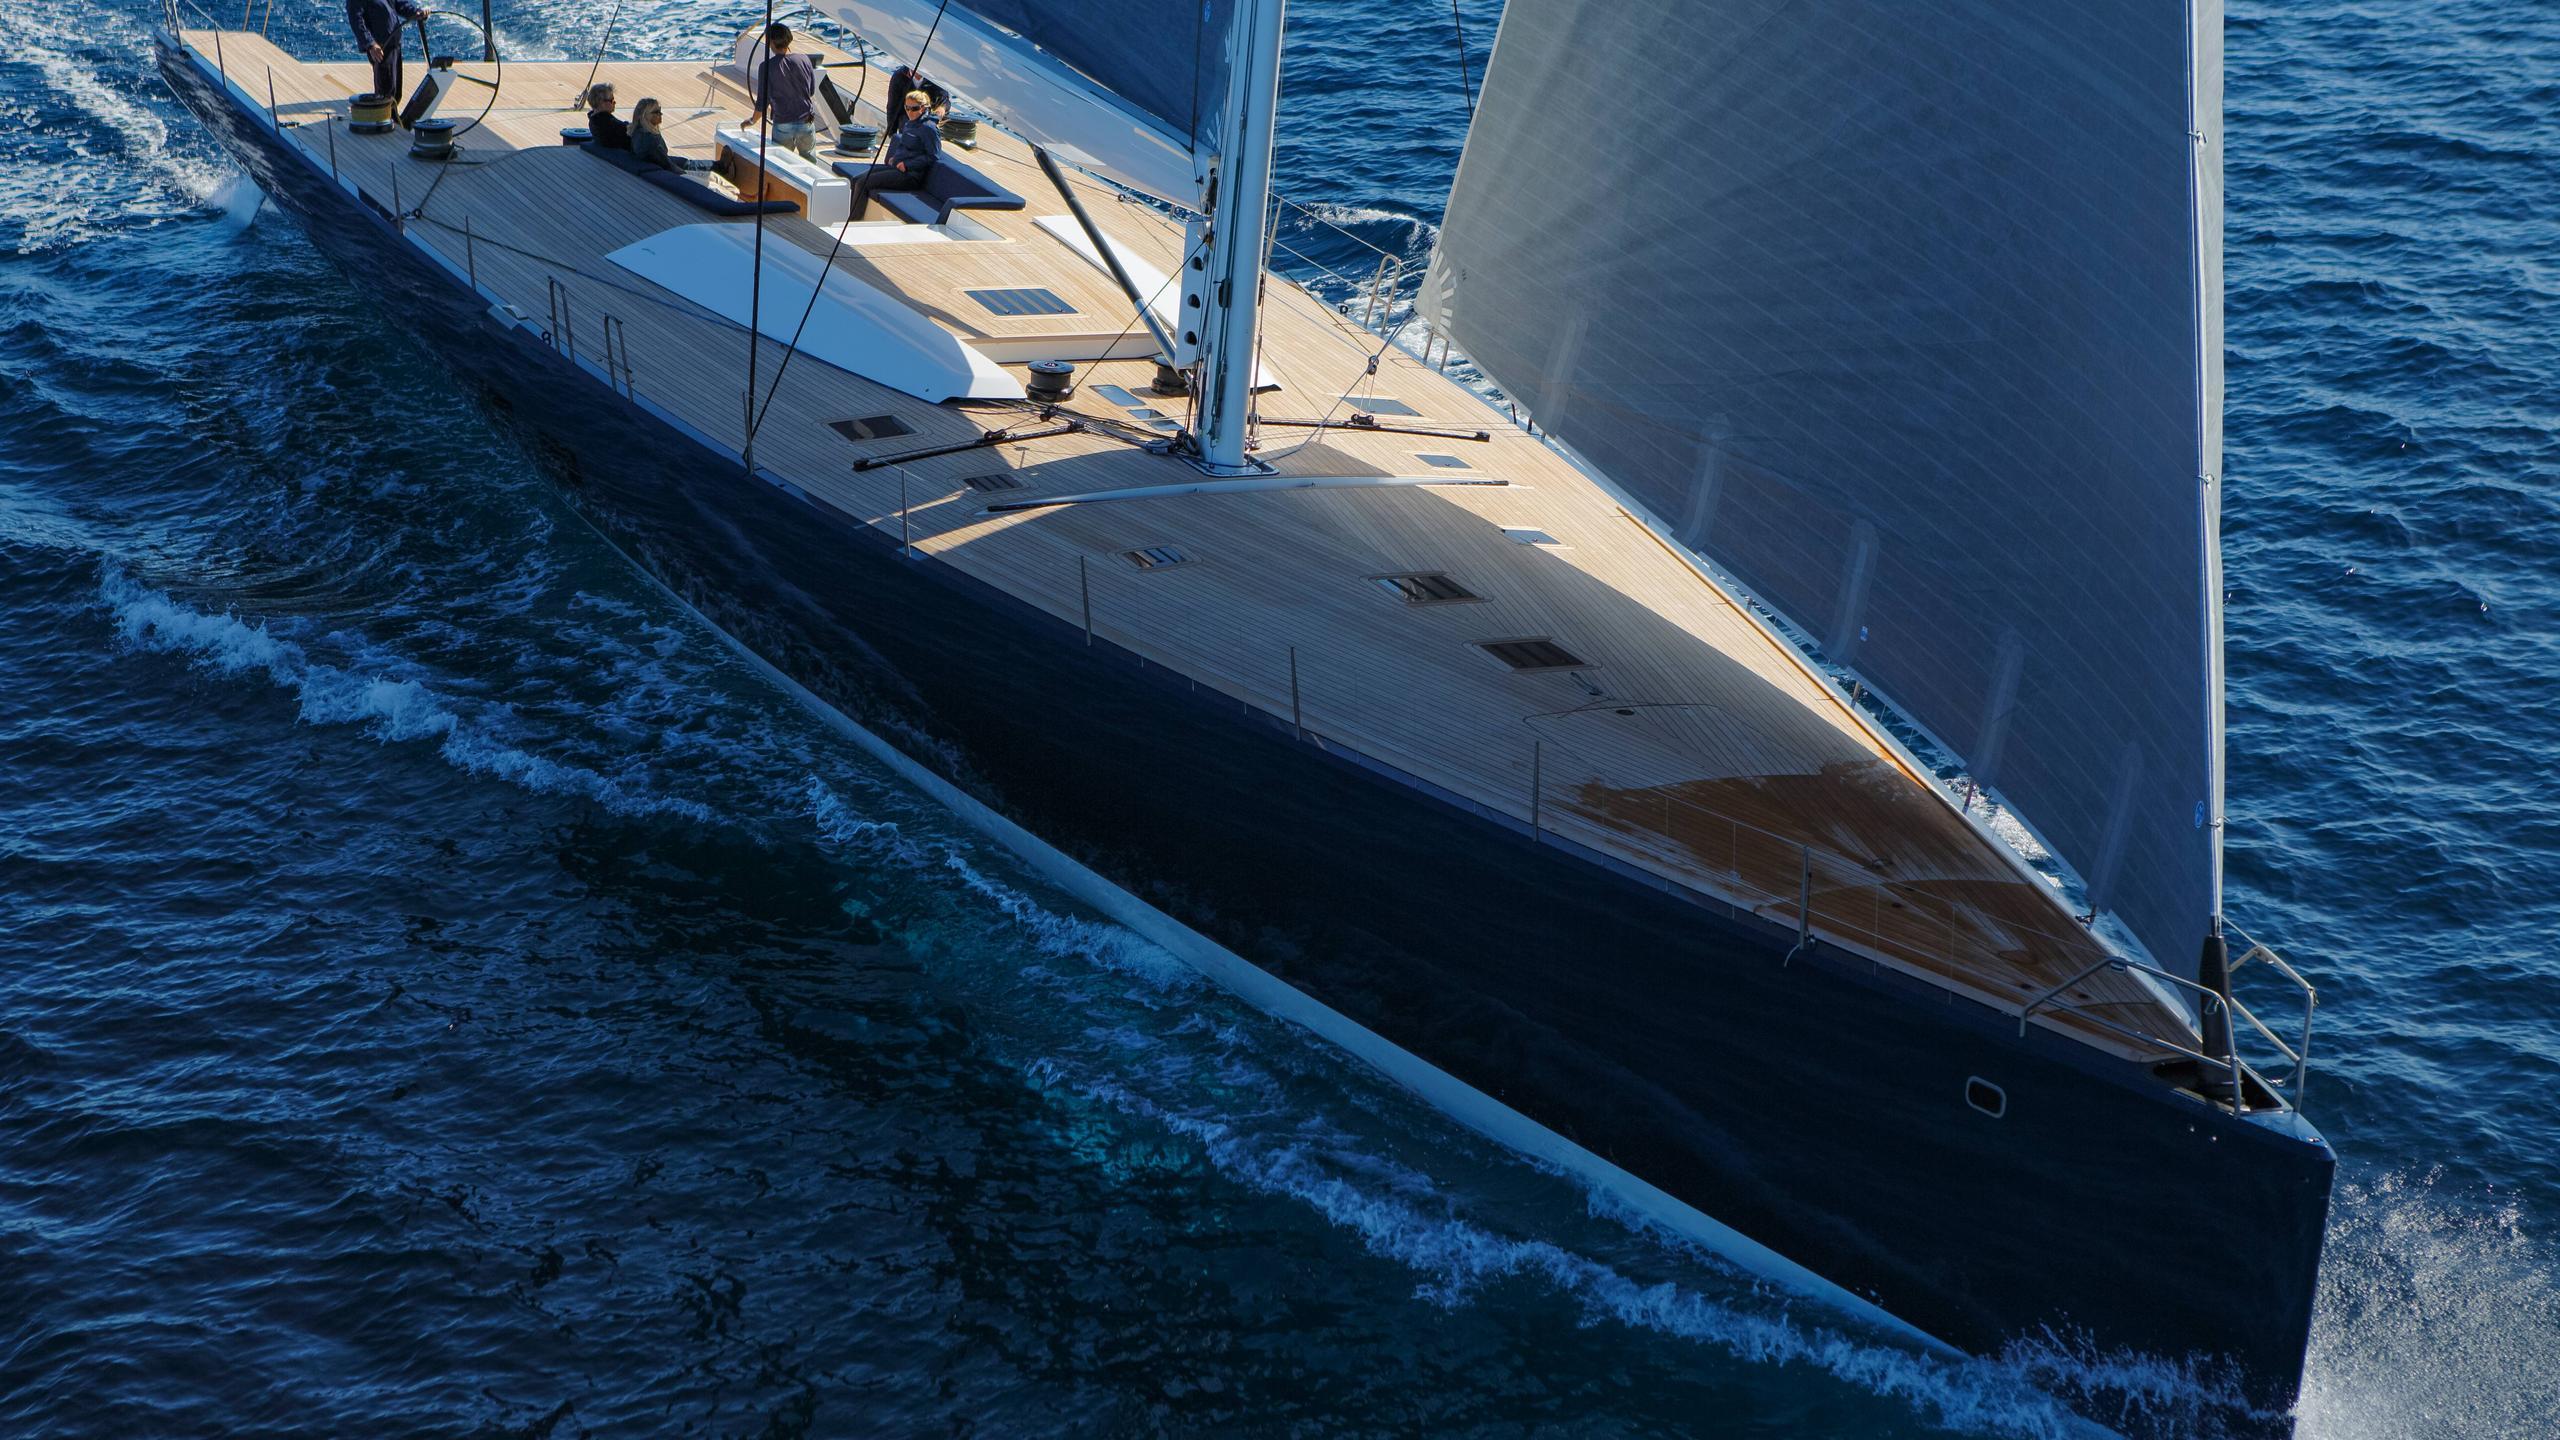 Magic-Carpet-iii-sailing-yacht-wally-21013-30m-aerial-cruising